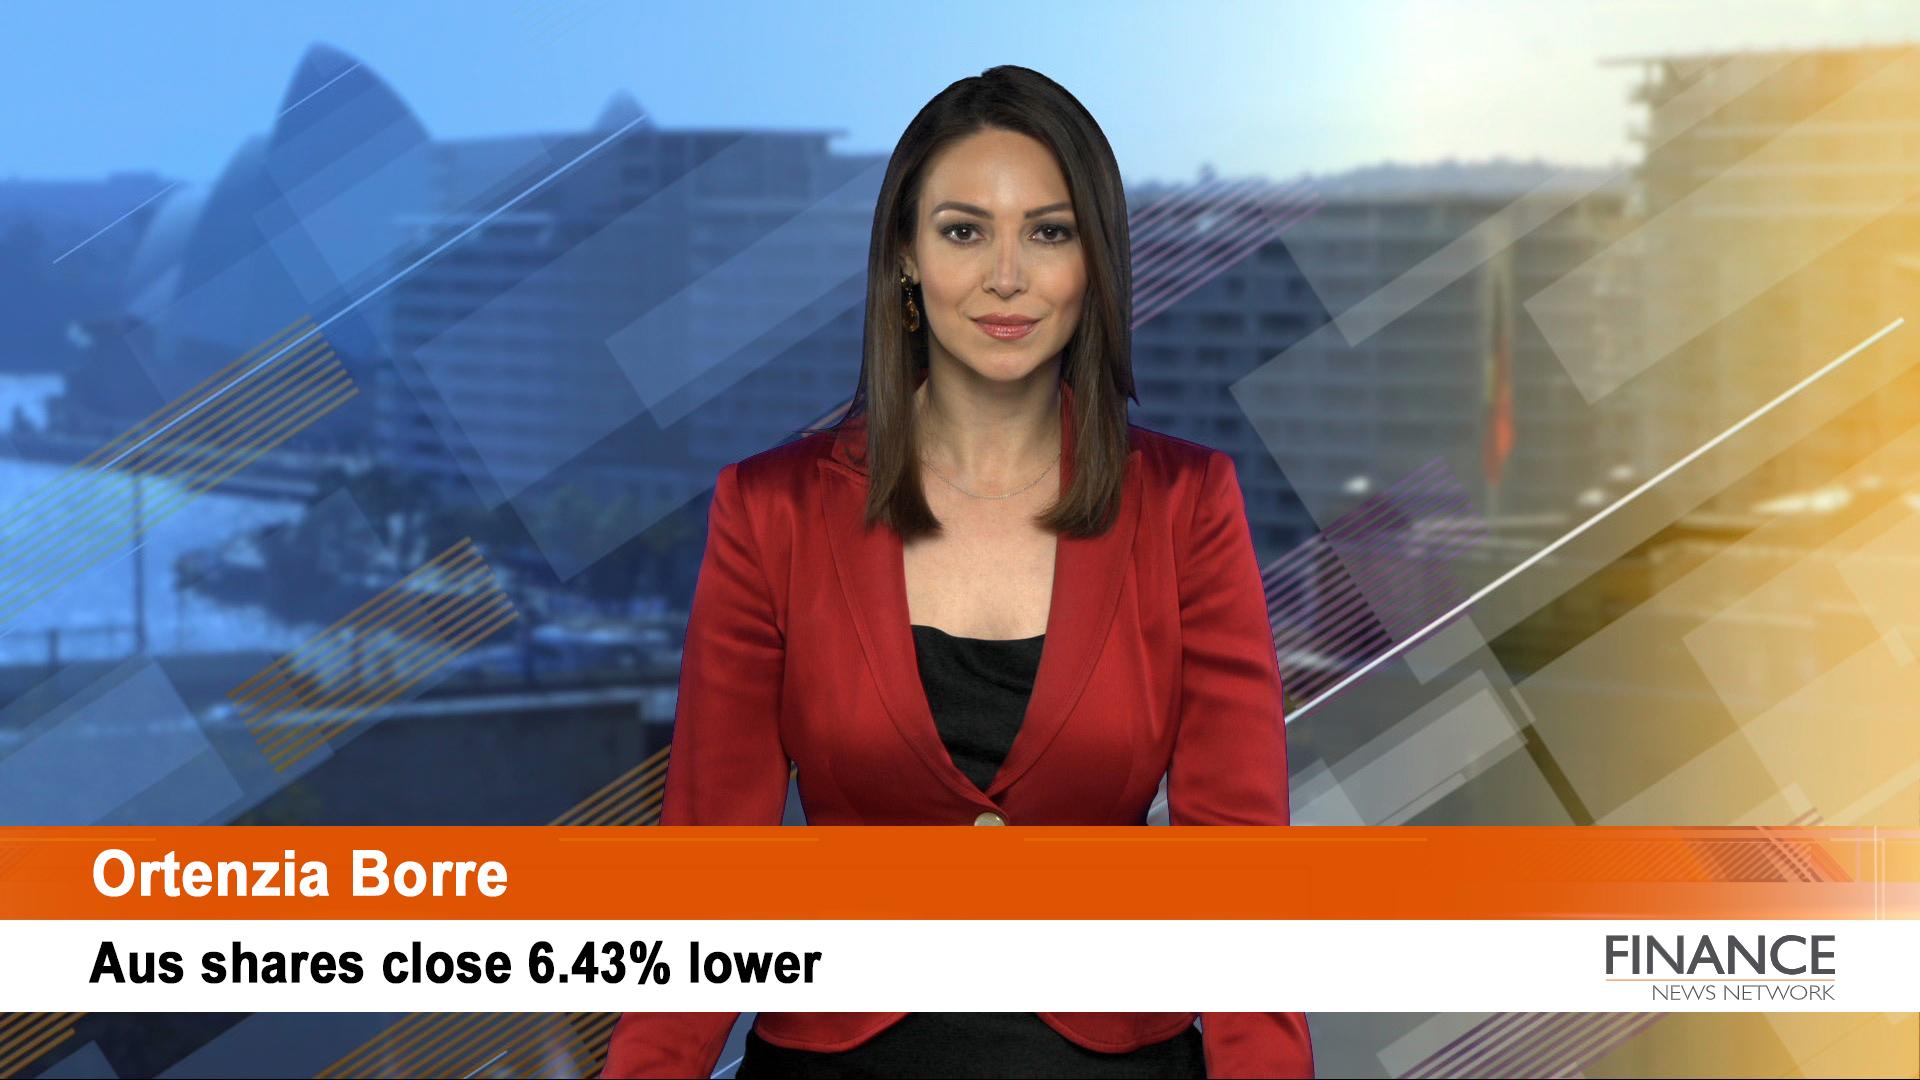 Energy sector plummets: Aus shares close 6.4% lower